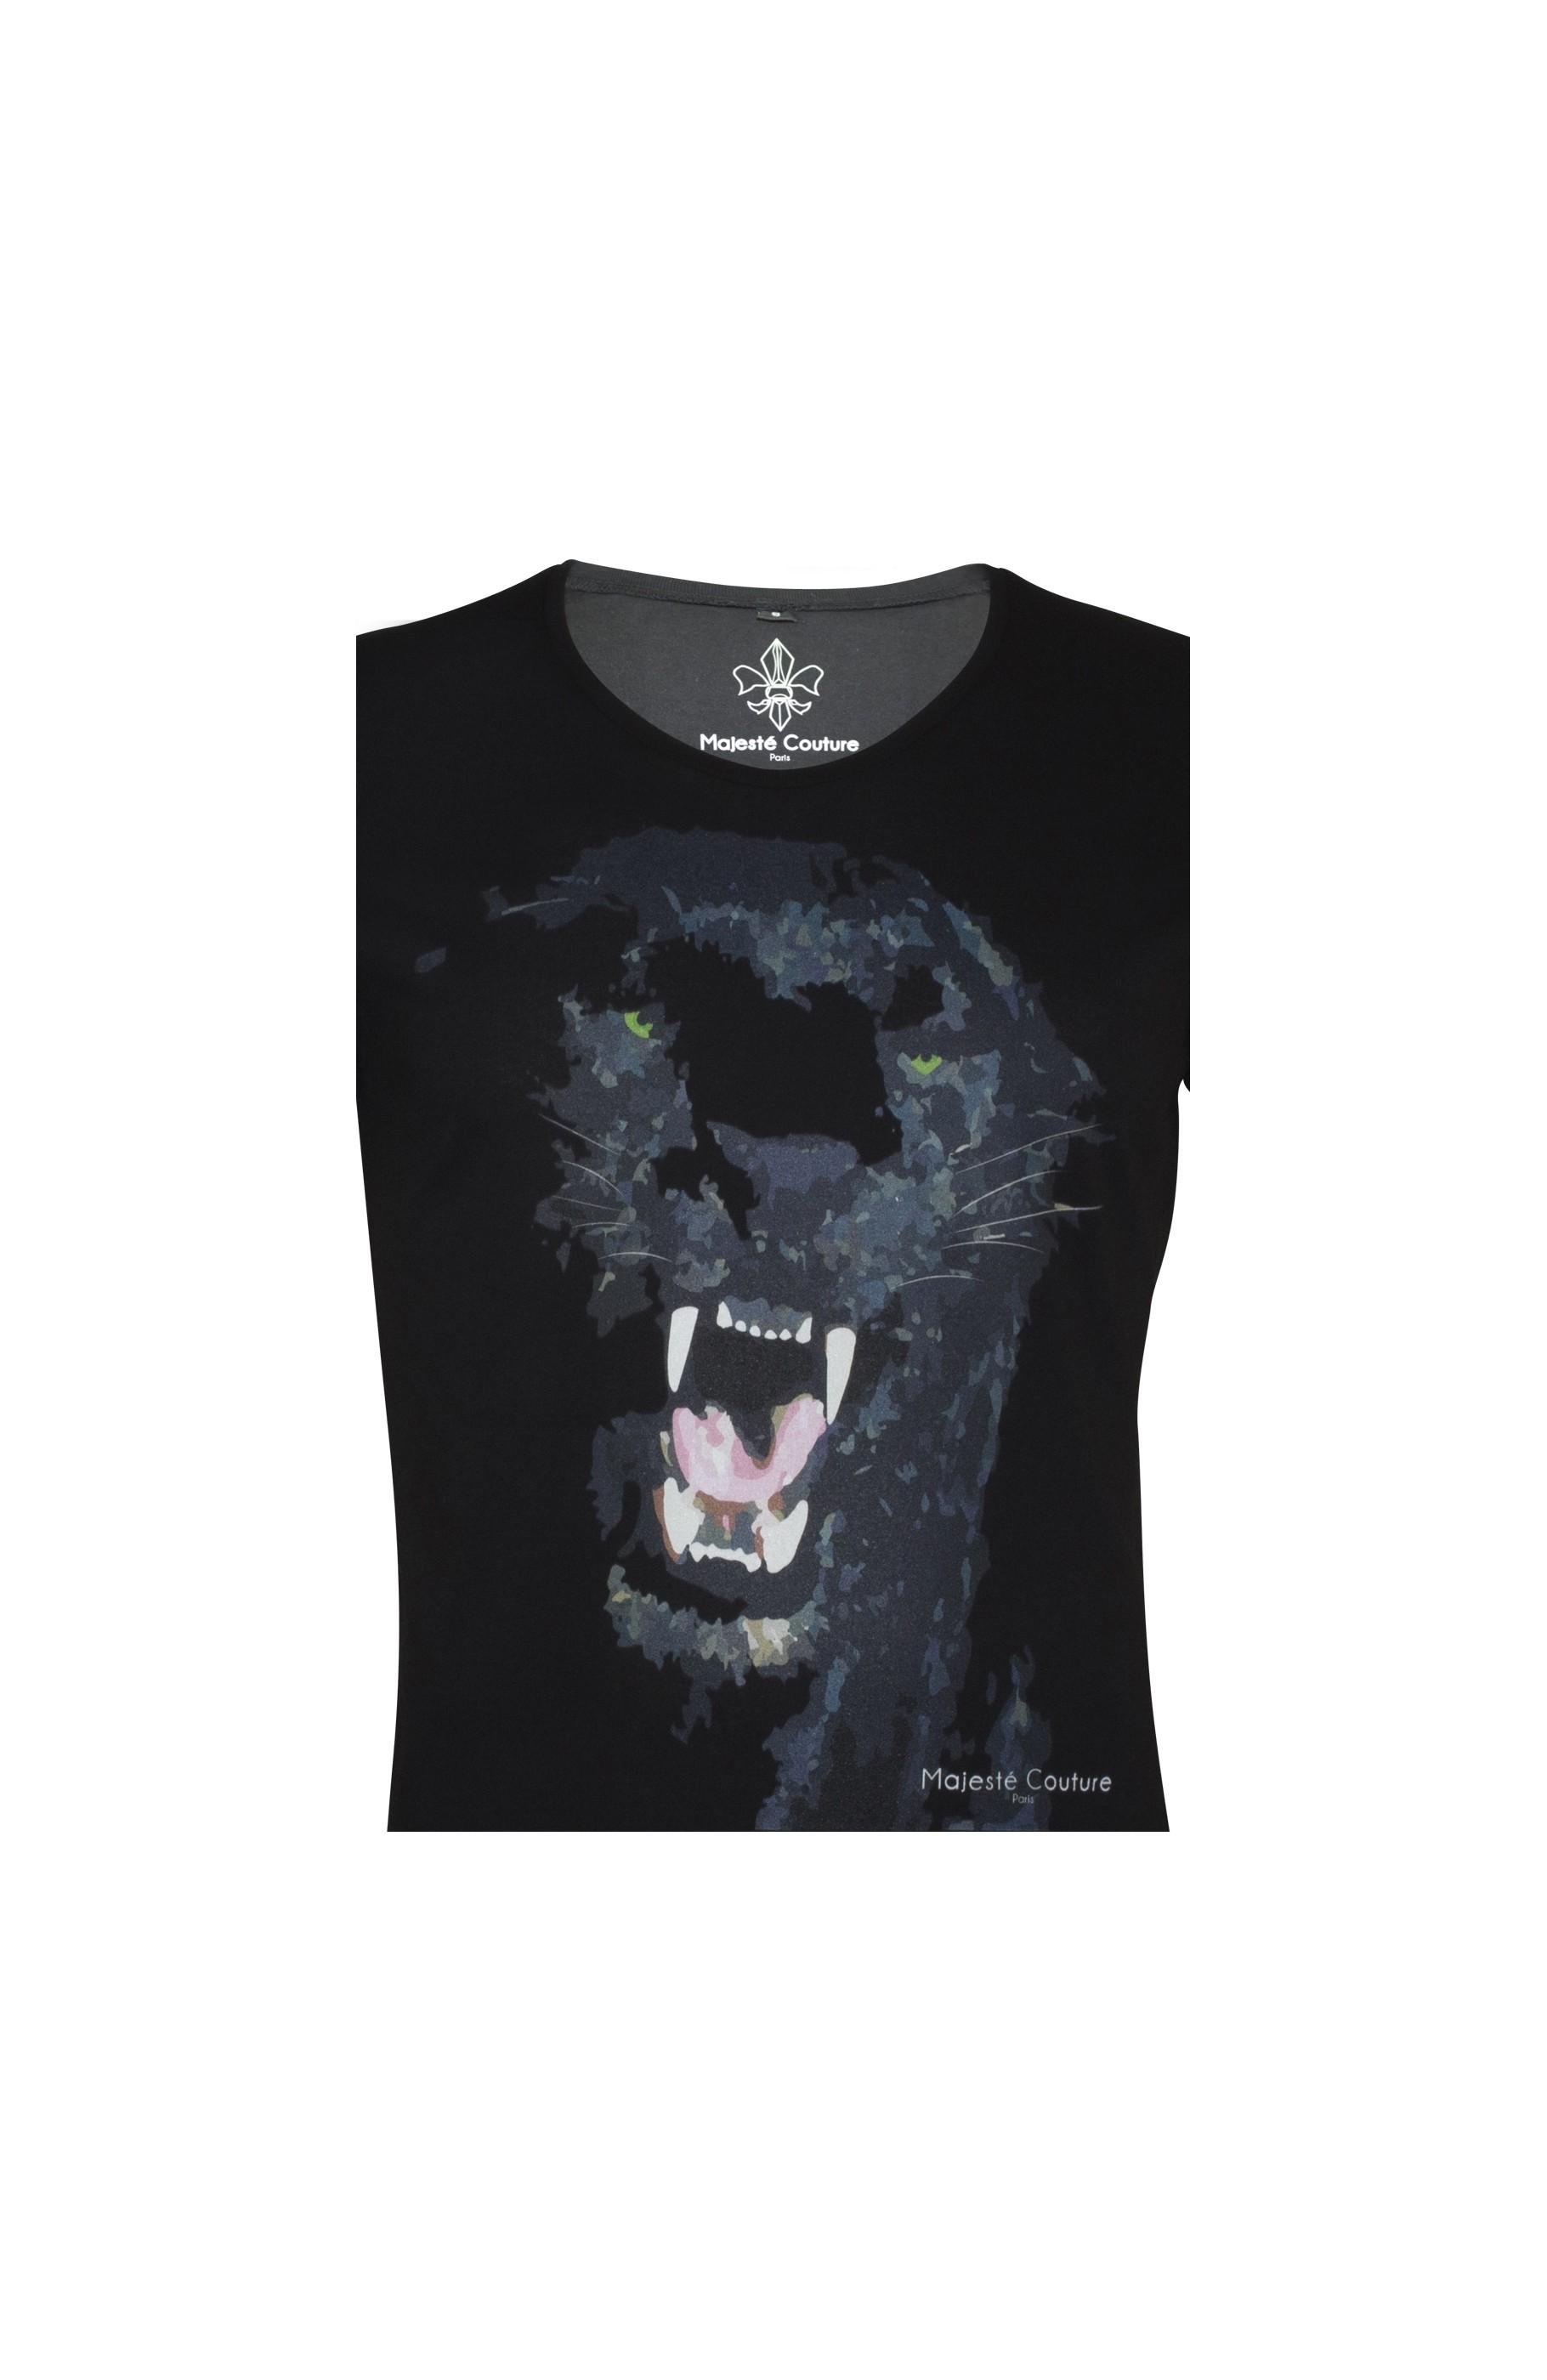 Majesté Couture Paris: PANTHER T-SHIRT | Clothing,Clothing > T-Shirts -  Hiphunters Shop